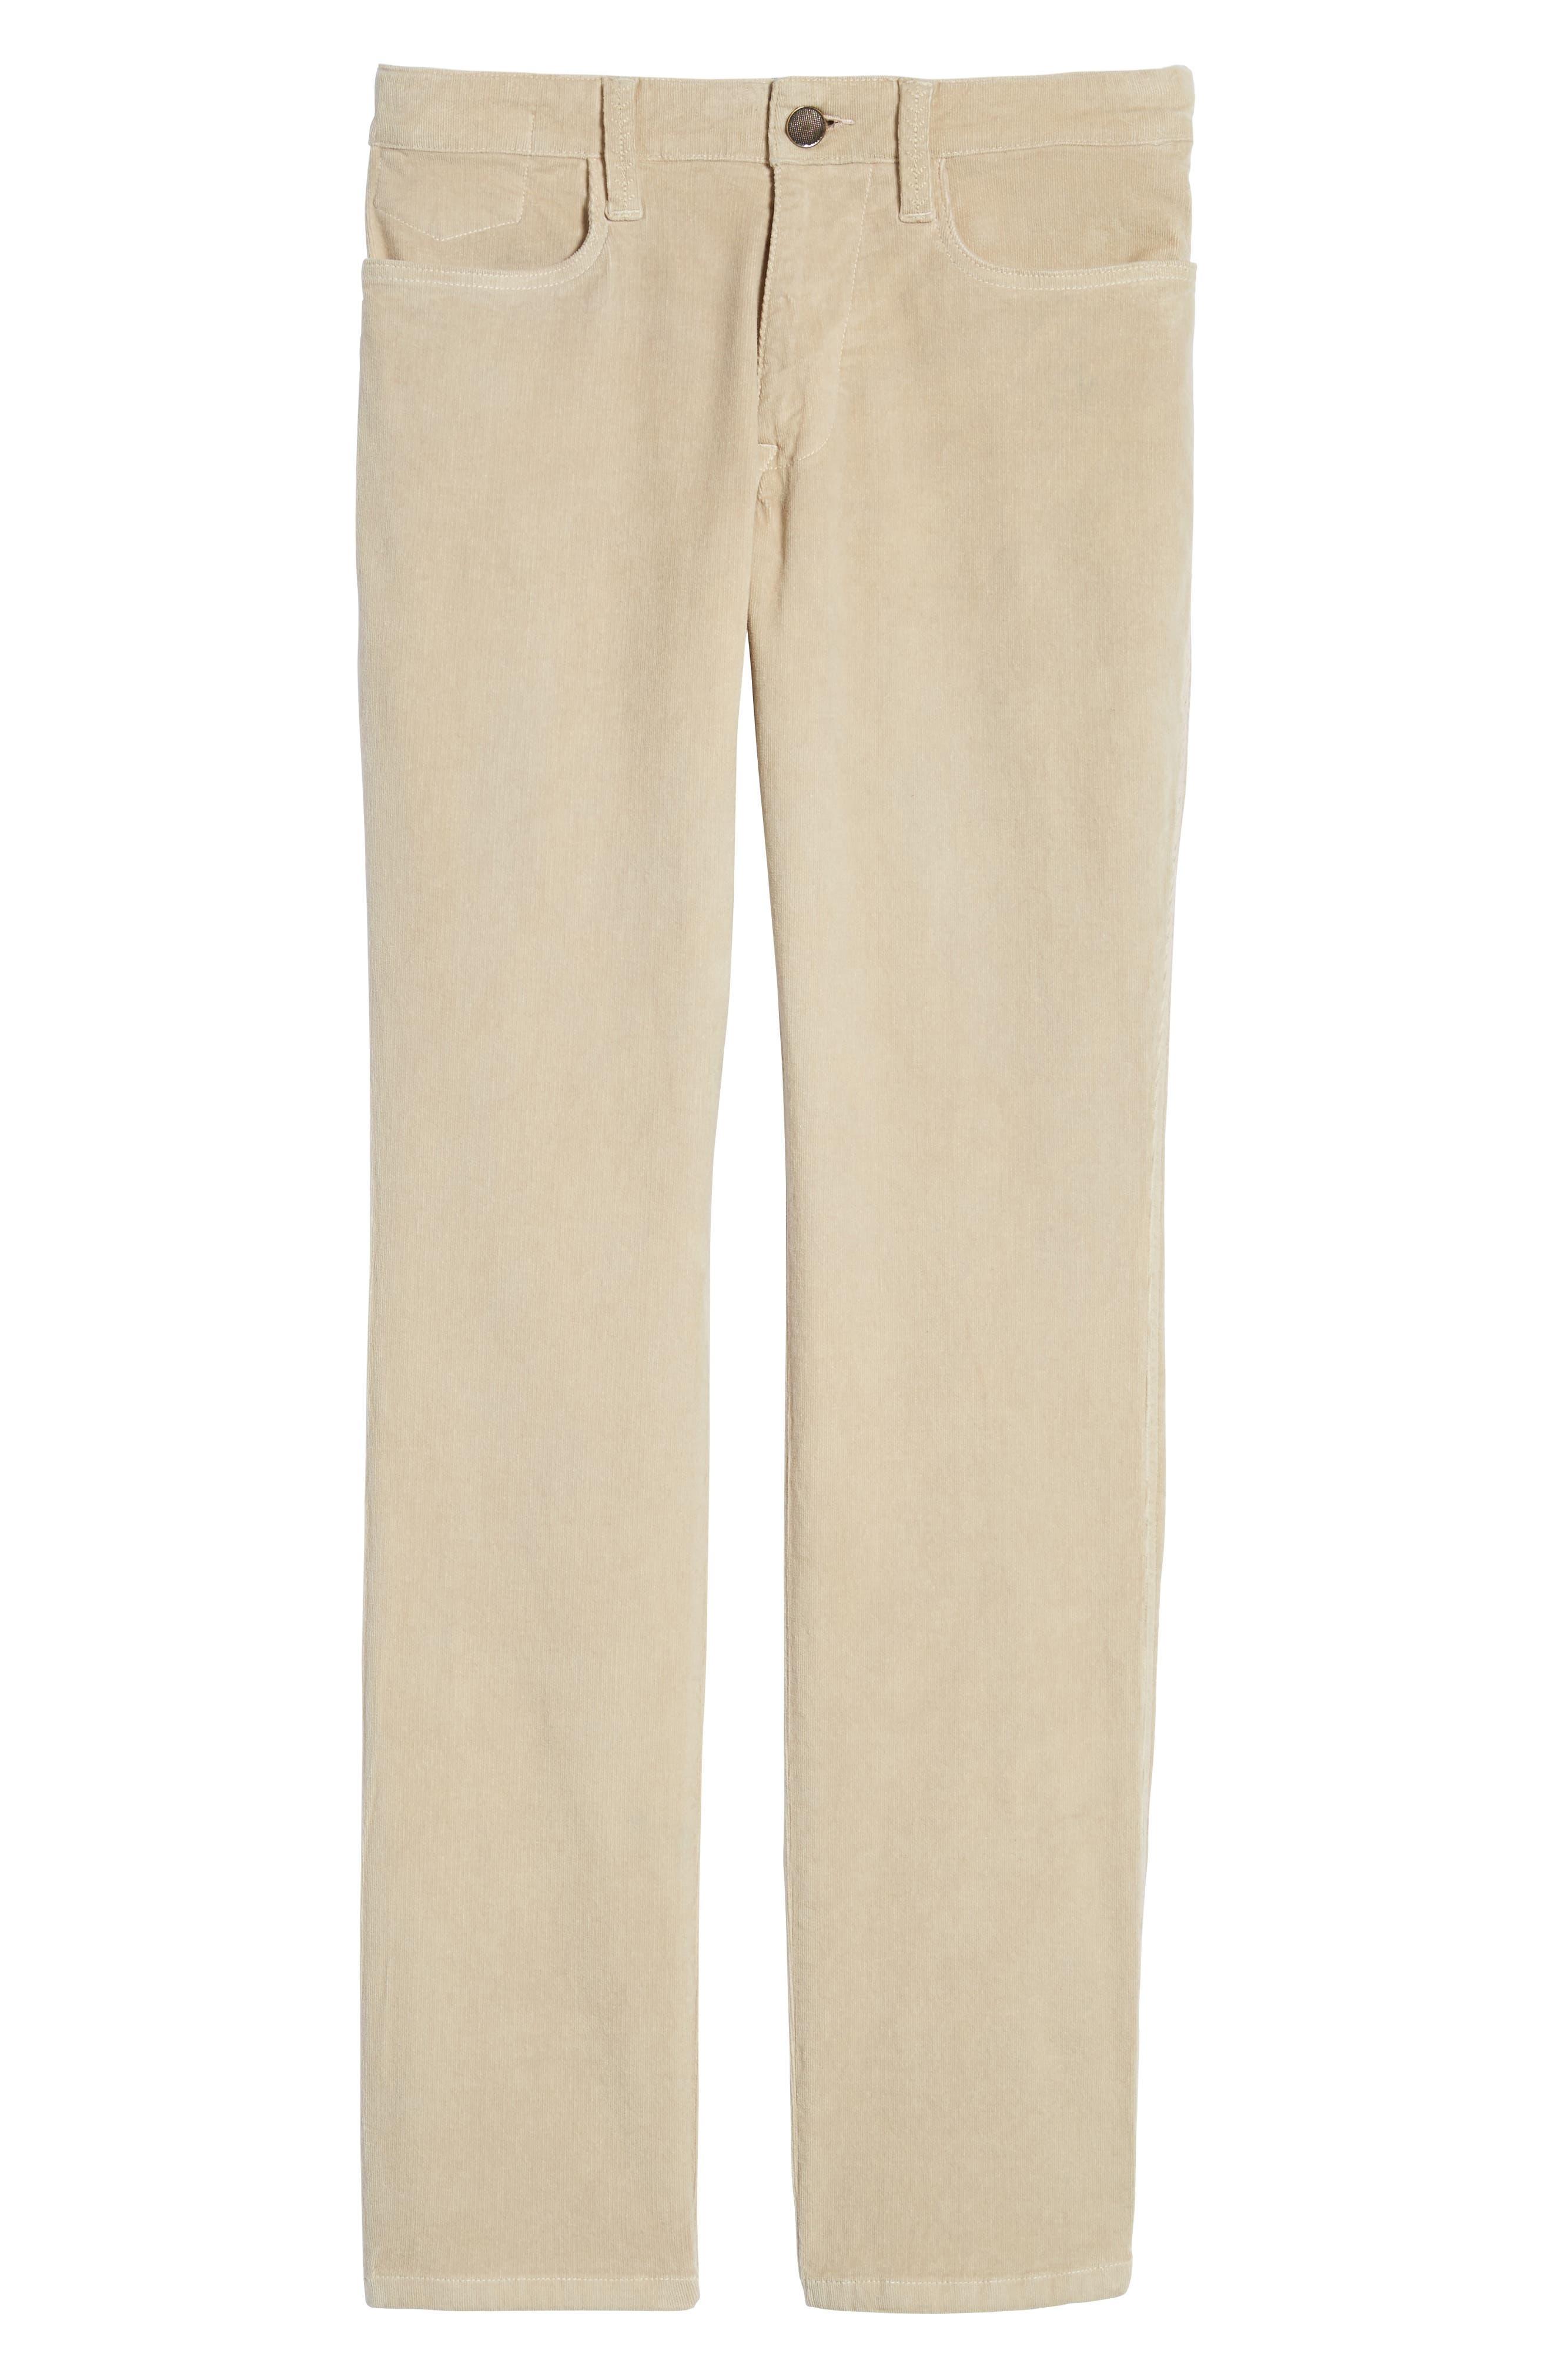 Modern Fit Stretch Corduroy Pants,                             Alternate thumbnail 6, color,                             Oatmeal